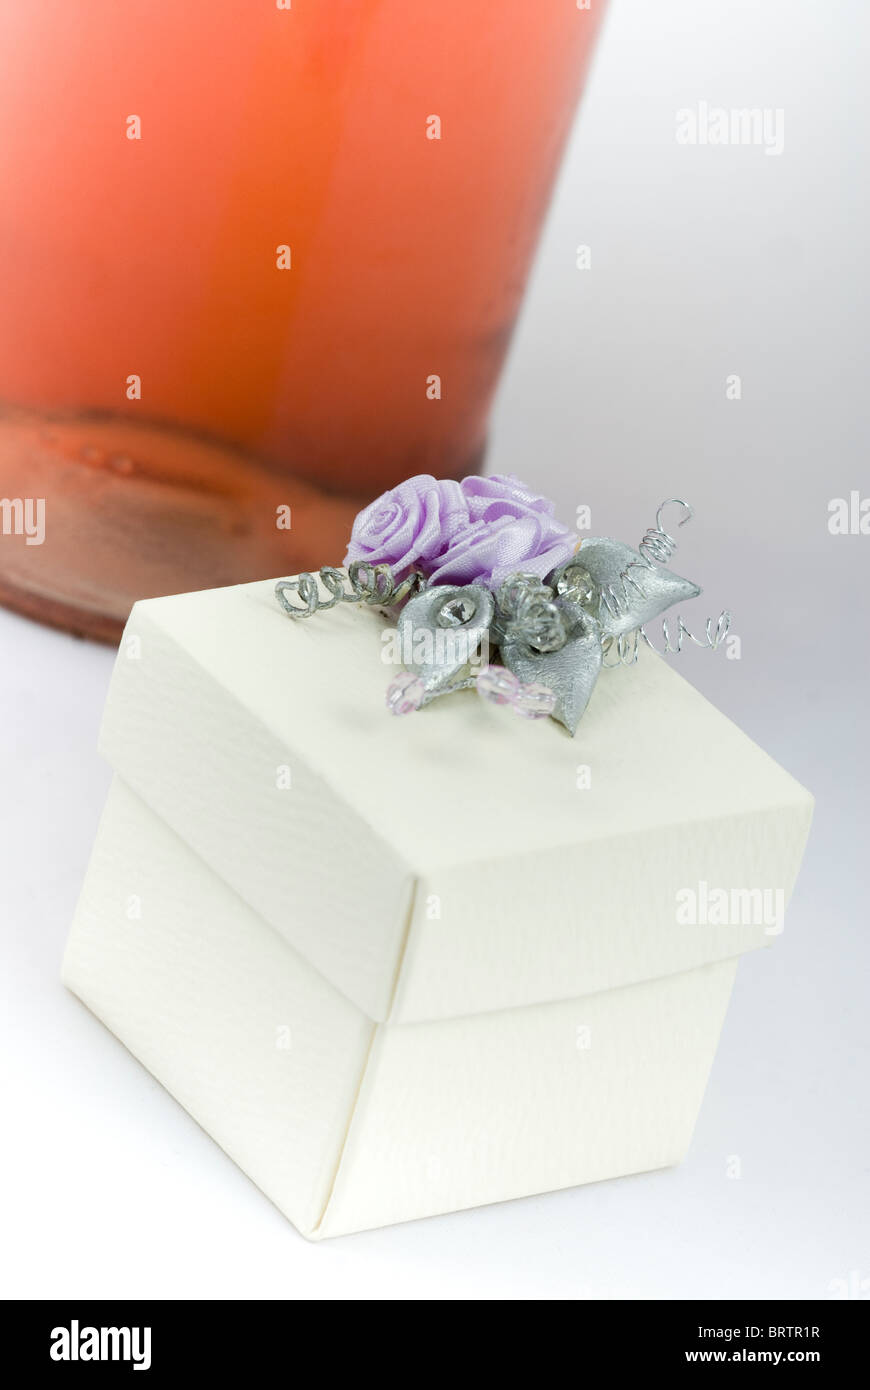 Wedding Favor Stock Photos & Wedding Favor Stock Images - Alamy